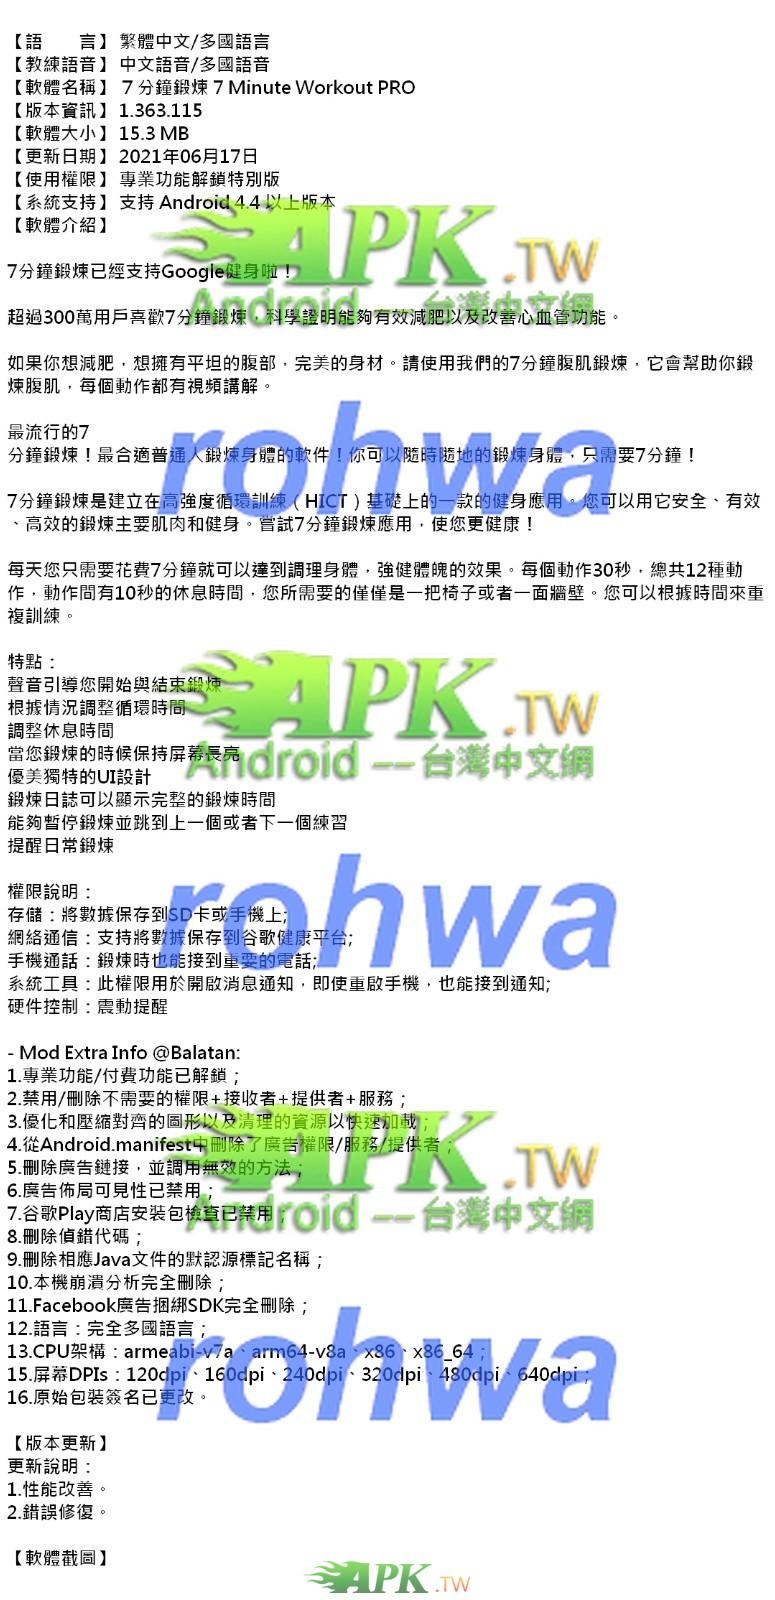 7MinuteWorkout_PRO_1.363.115_.jpg